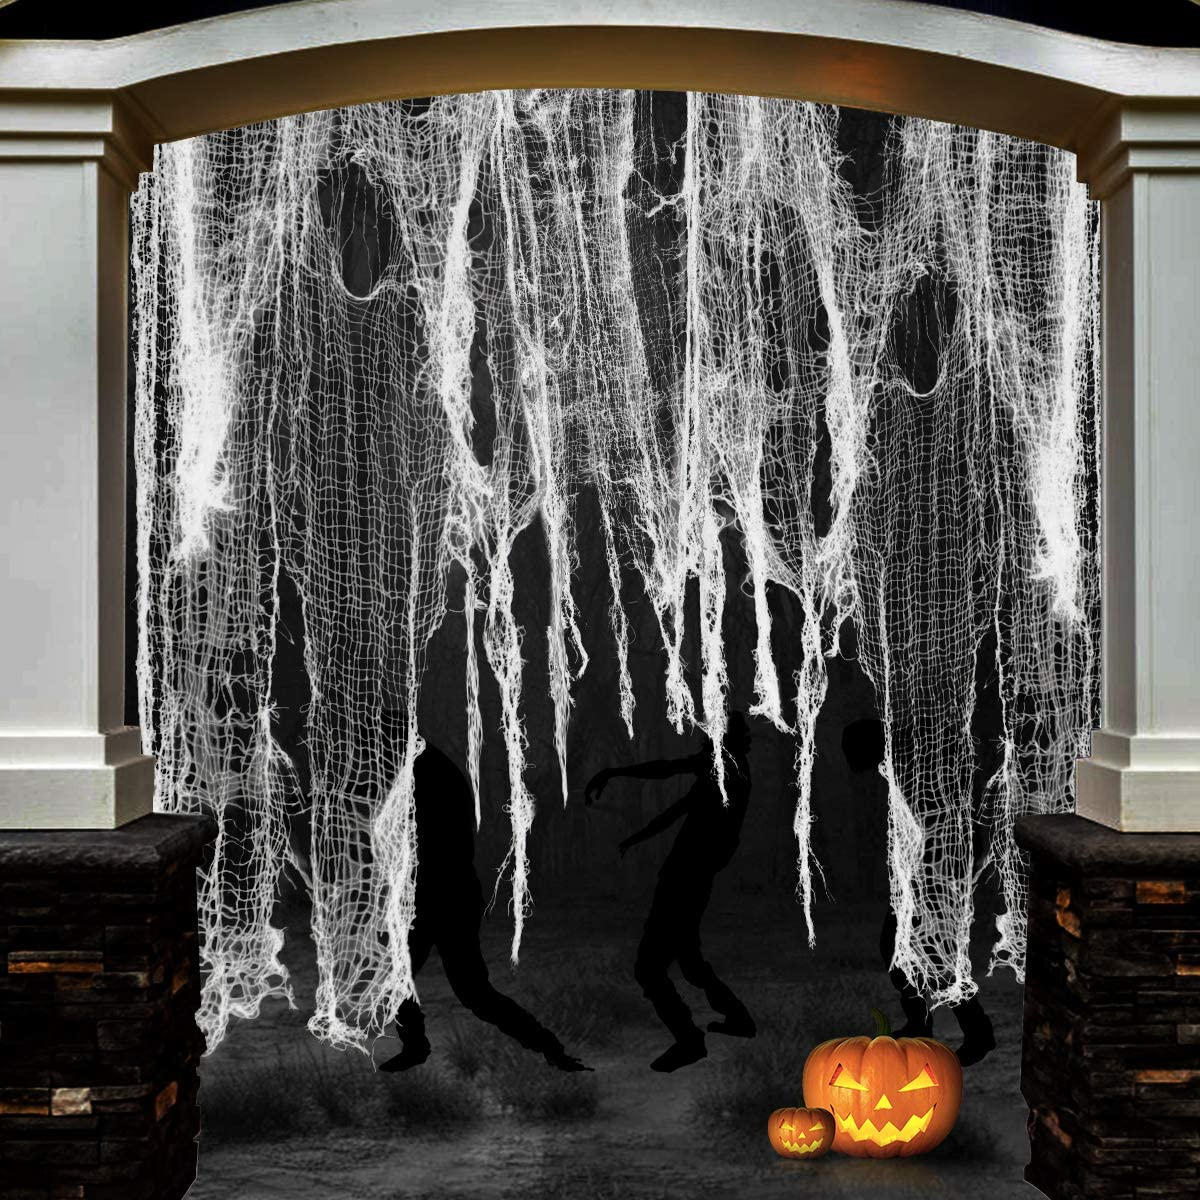 Aitey Halloween Creepy Cloth, 480 x 30 Inch Halloween Decor Spooky Drape Doorways Entryways Windows Scary Cover Gauze Halloween Party Decorations & Supplies (White)